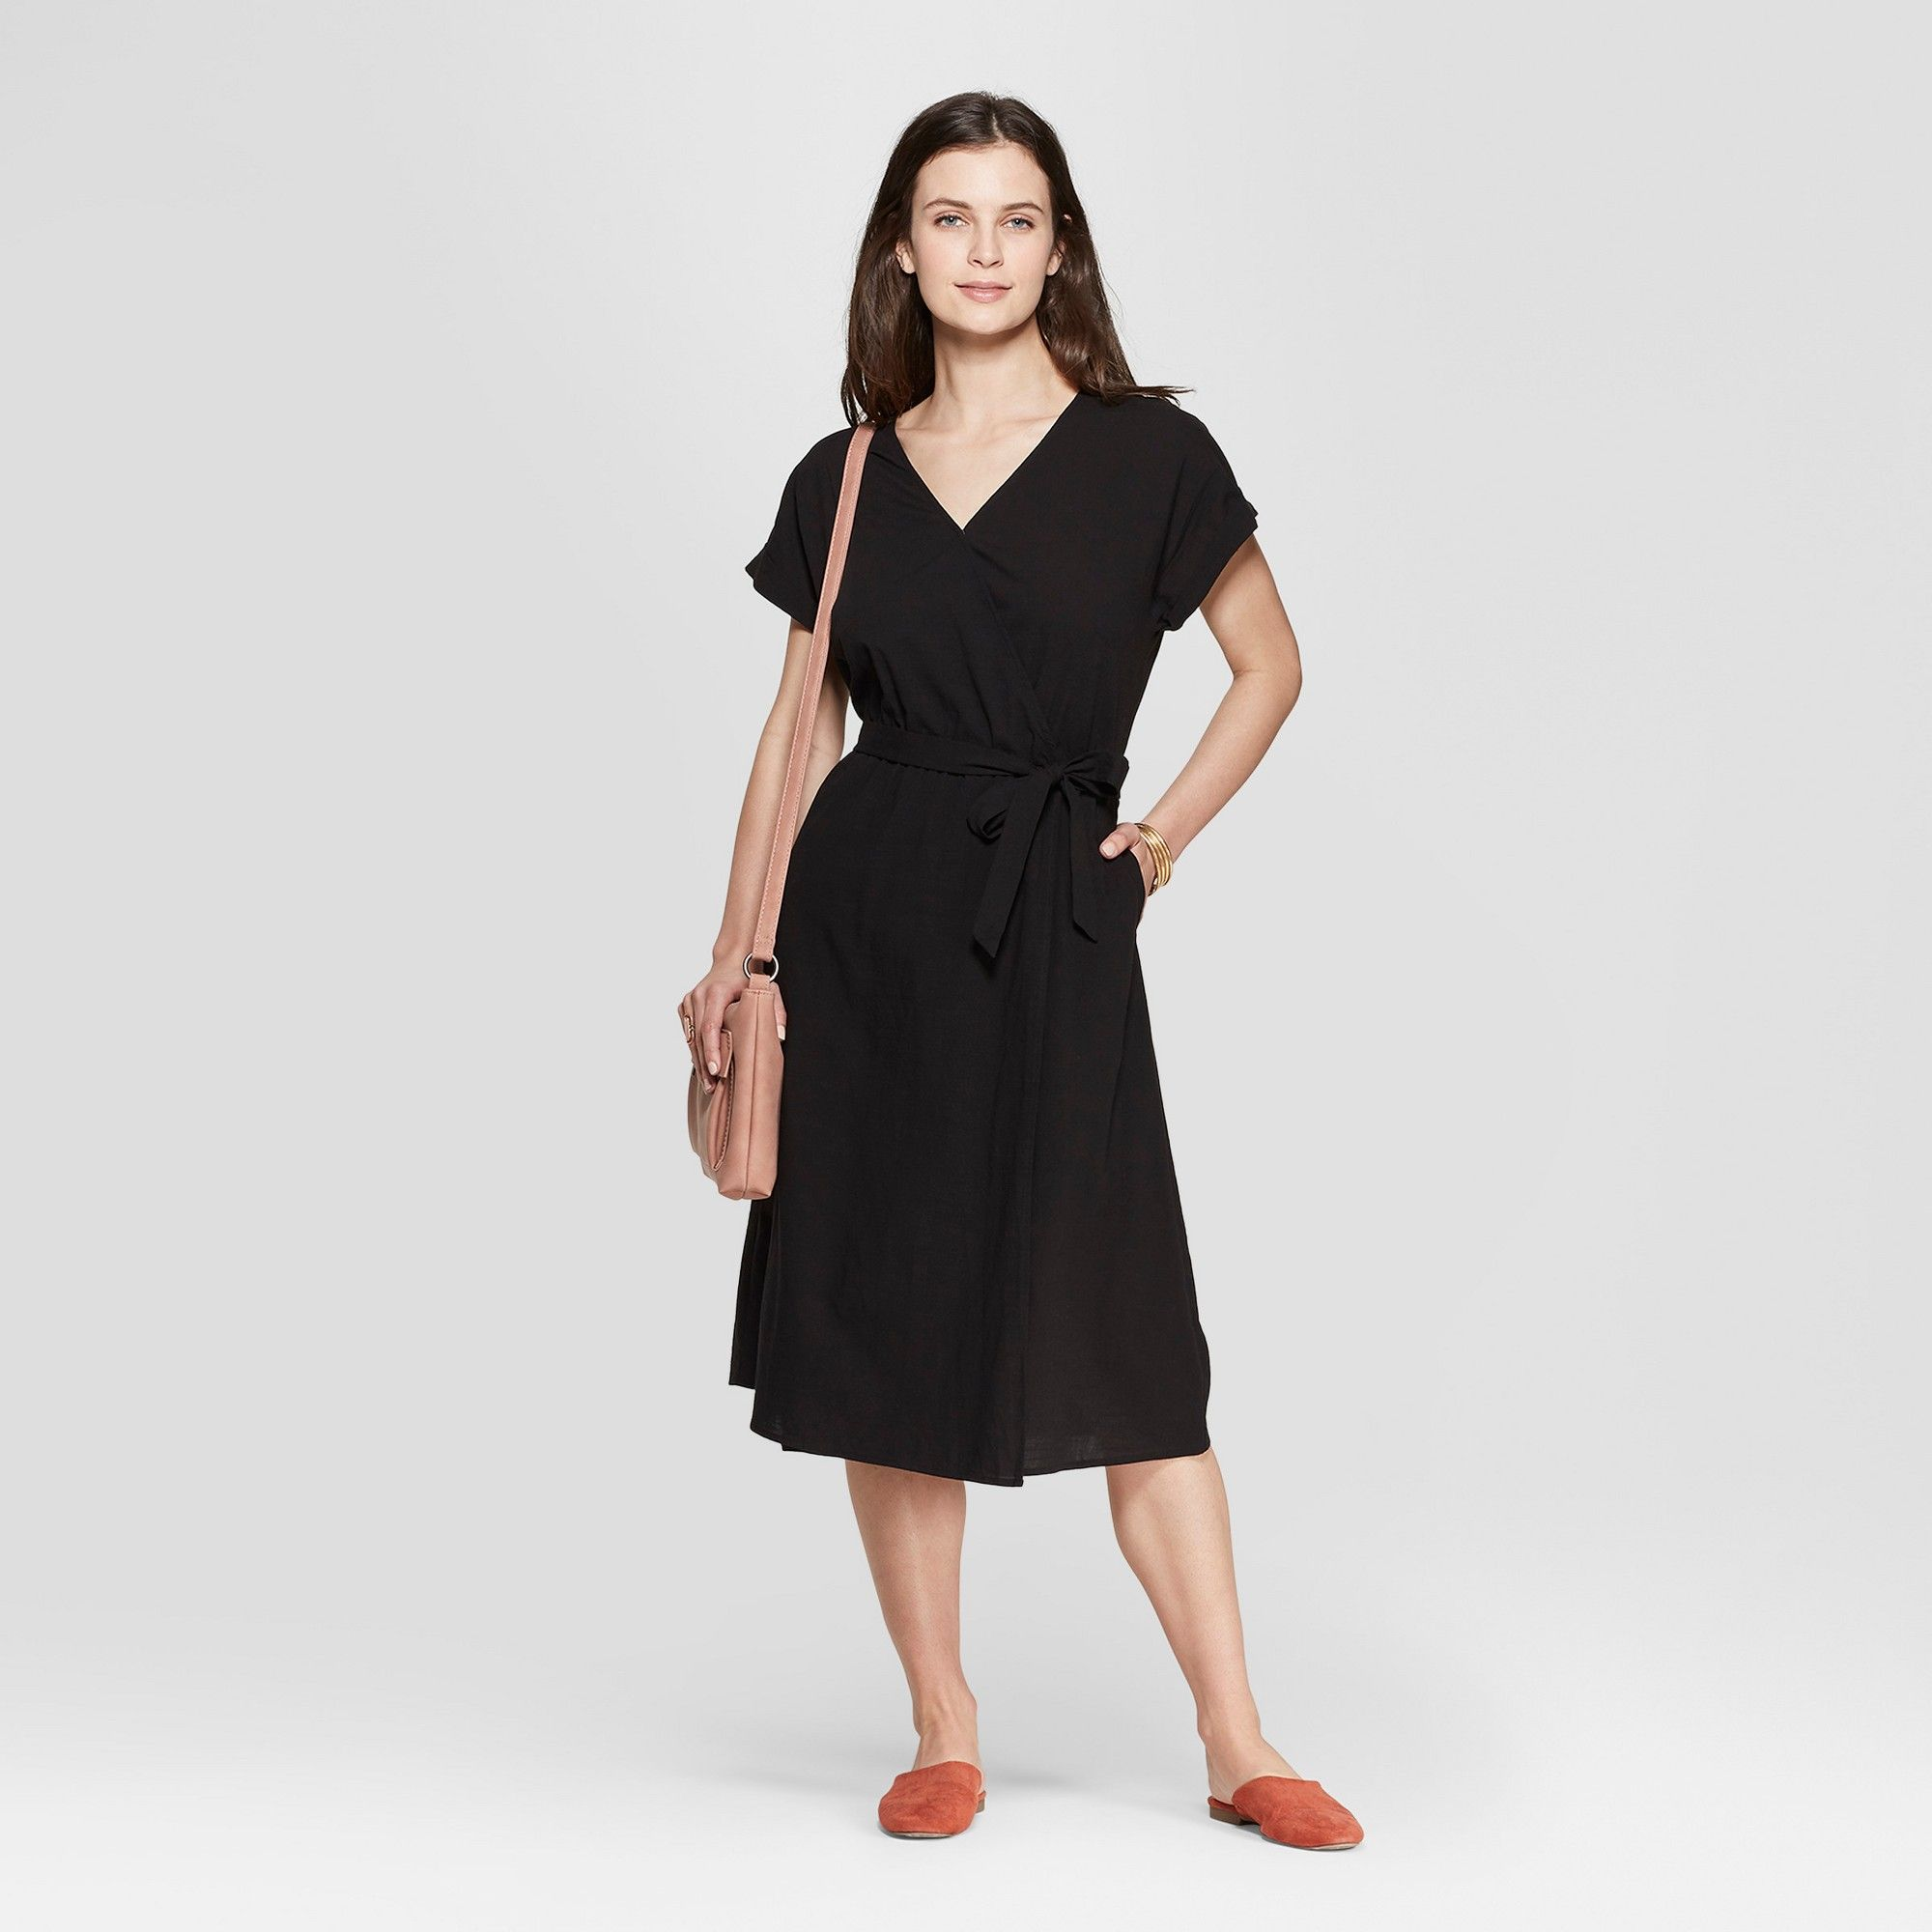 Women S Short Sleeve V Neck Midi Dress Universal Thread Black Xs V Neck Midi Dress Womens Shorts Midi Dress [ 2000 x 2000 Pixel ]